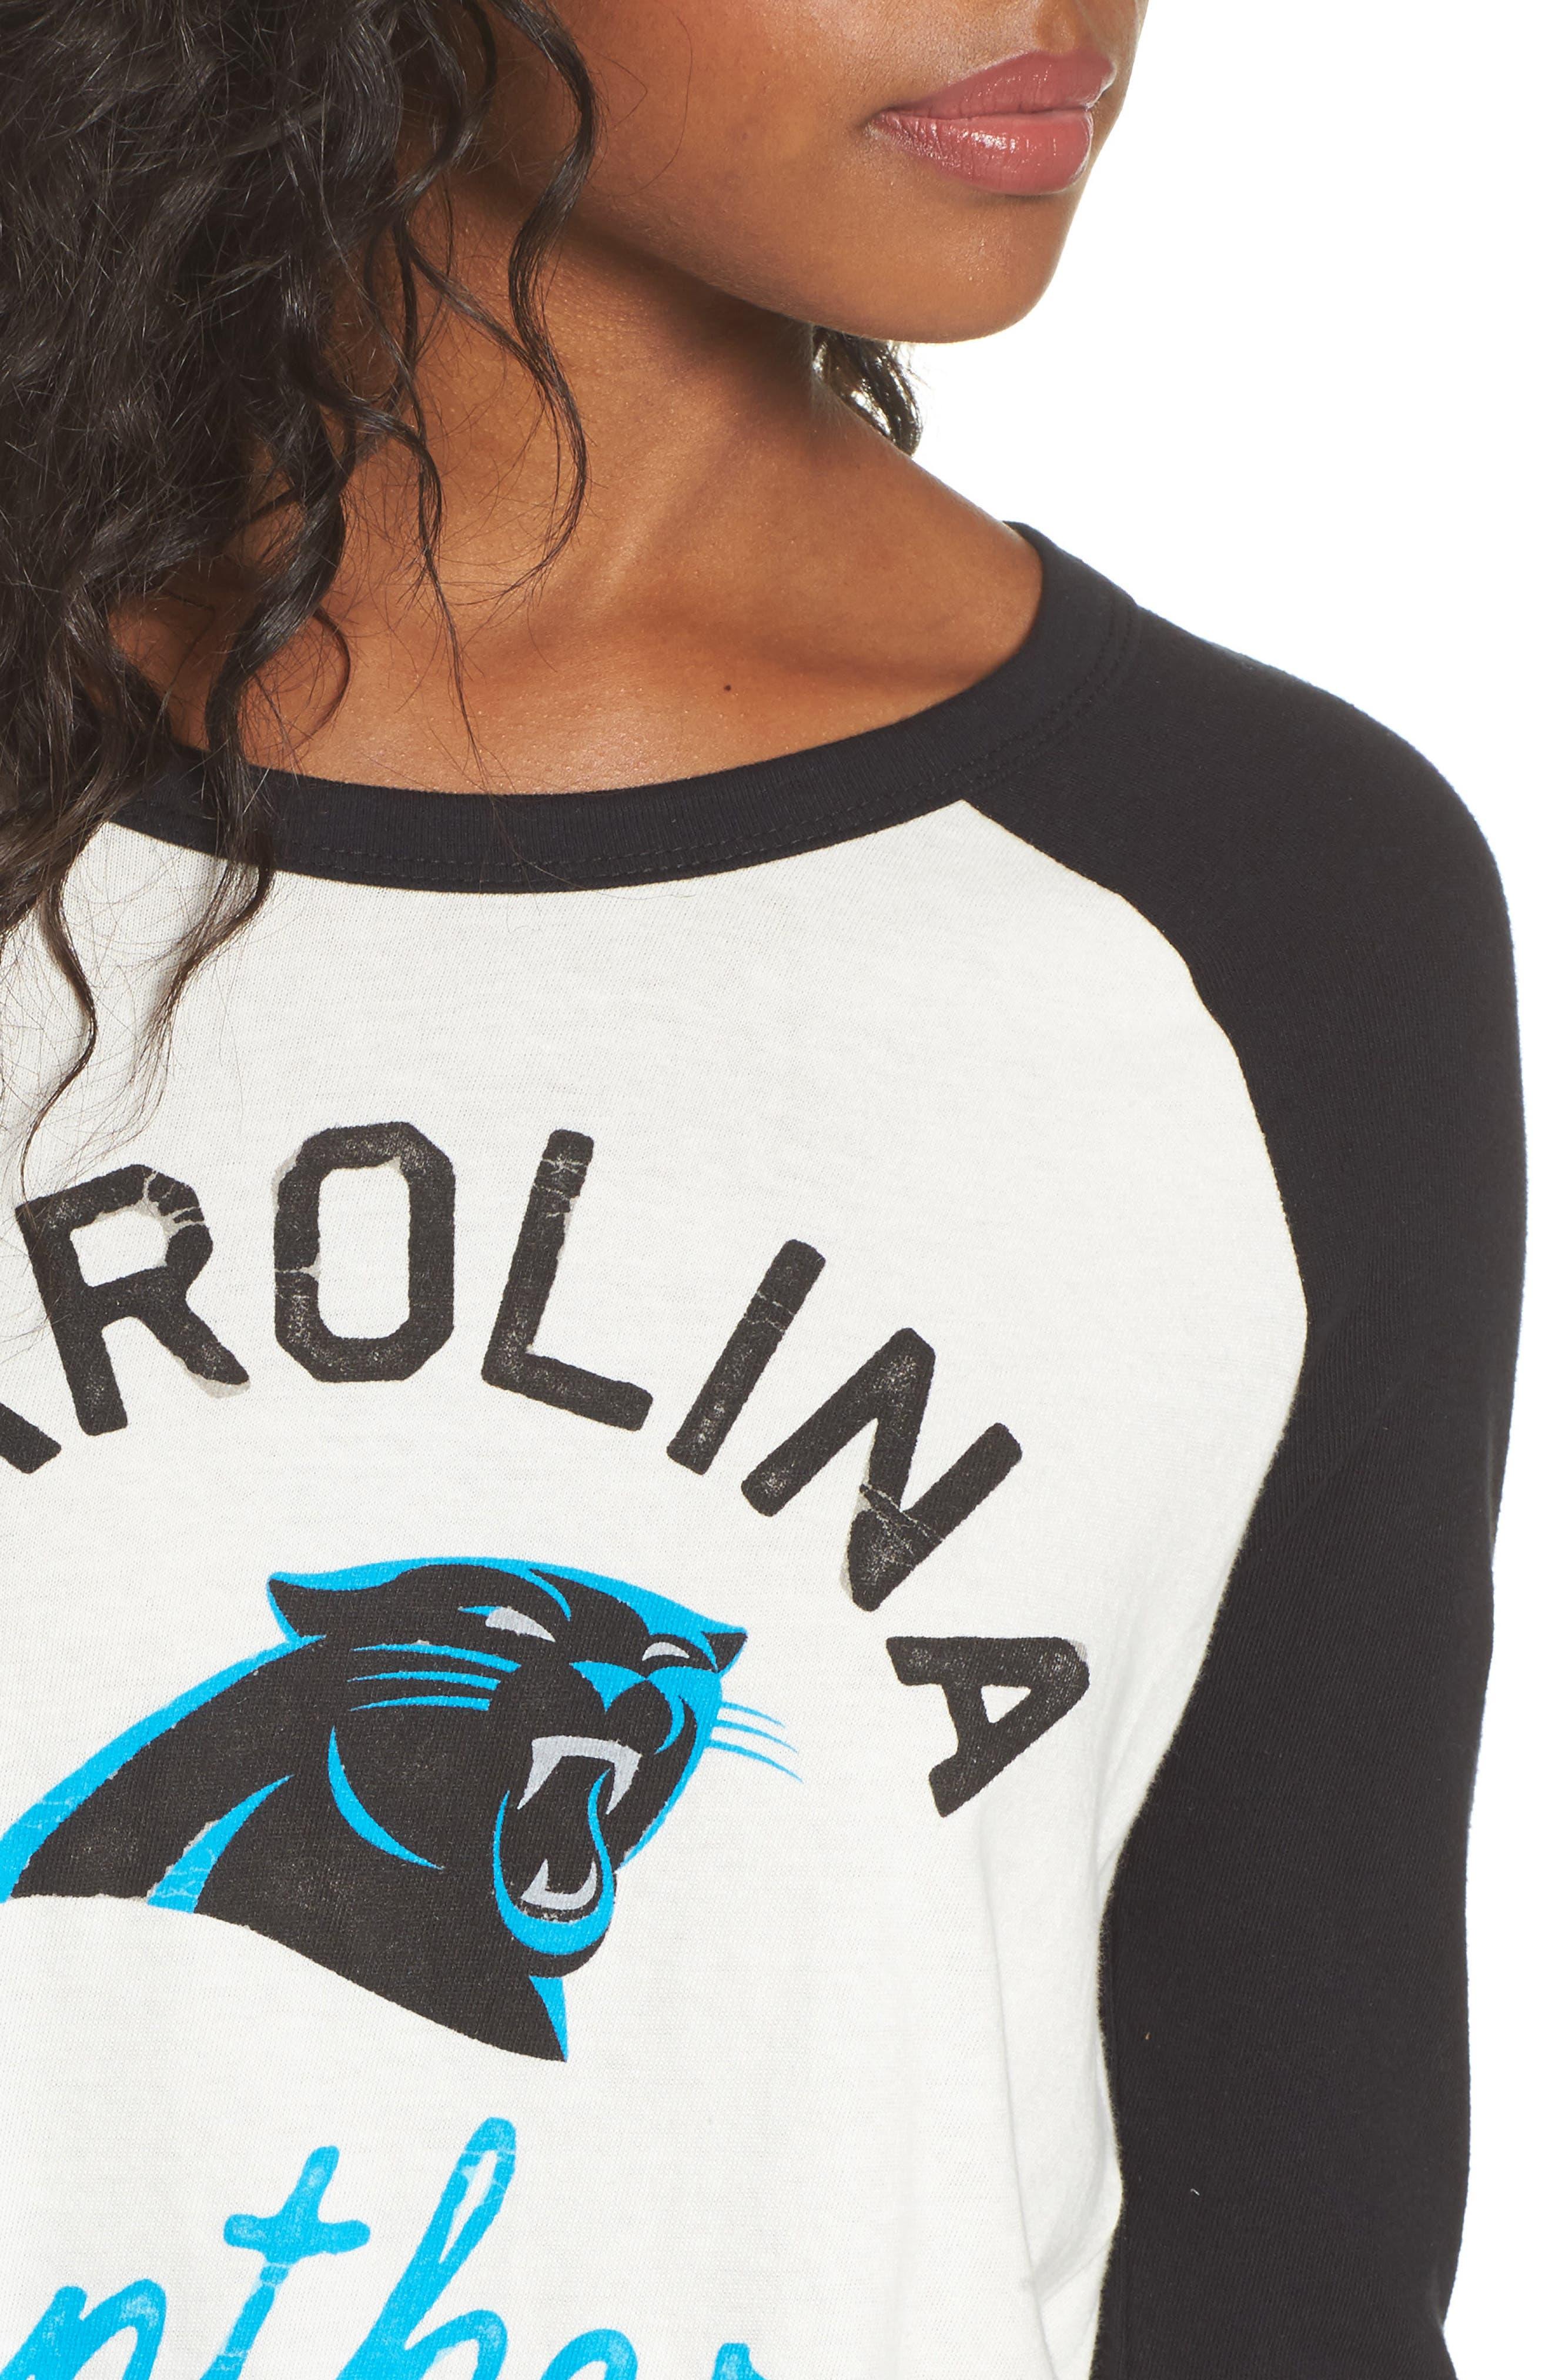 NFL Carolina Panthers Raglan Tee,                             Alternate thumbnail 4, color,                             189